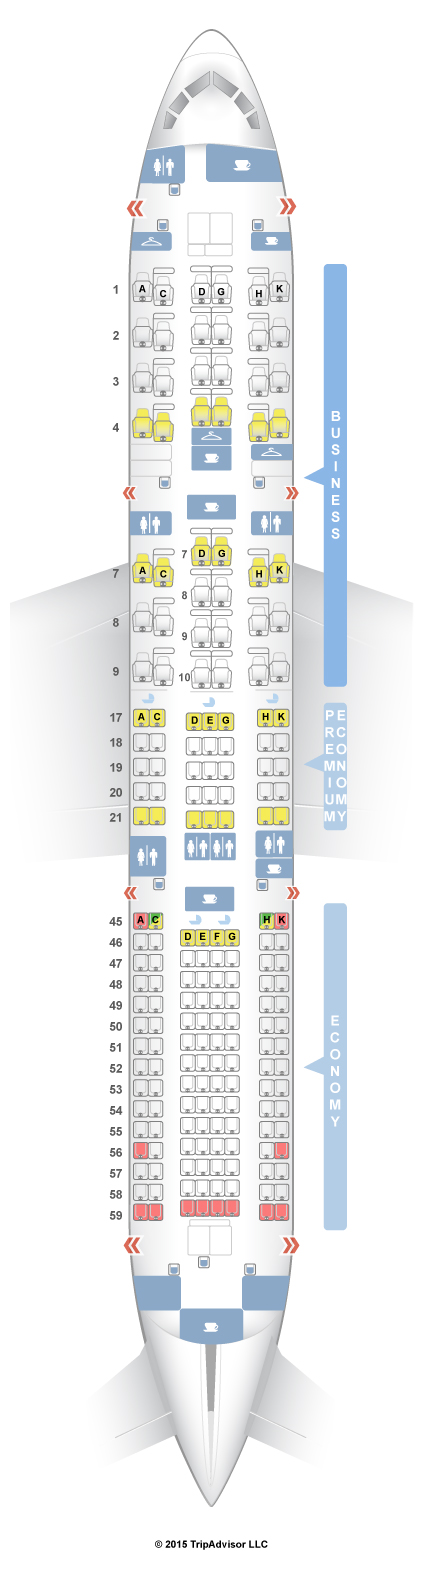 Seatguru Seat Map An Airlines Boeing 787 9 789